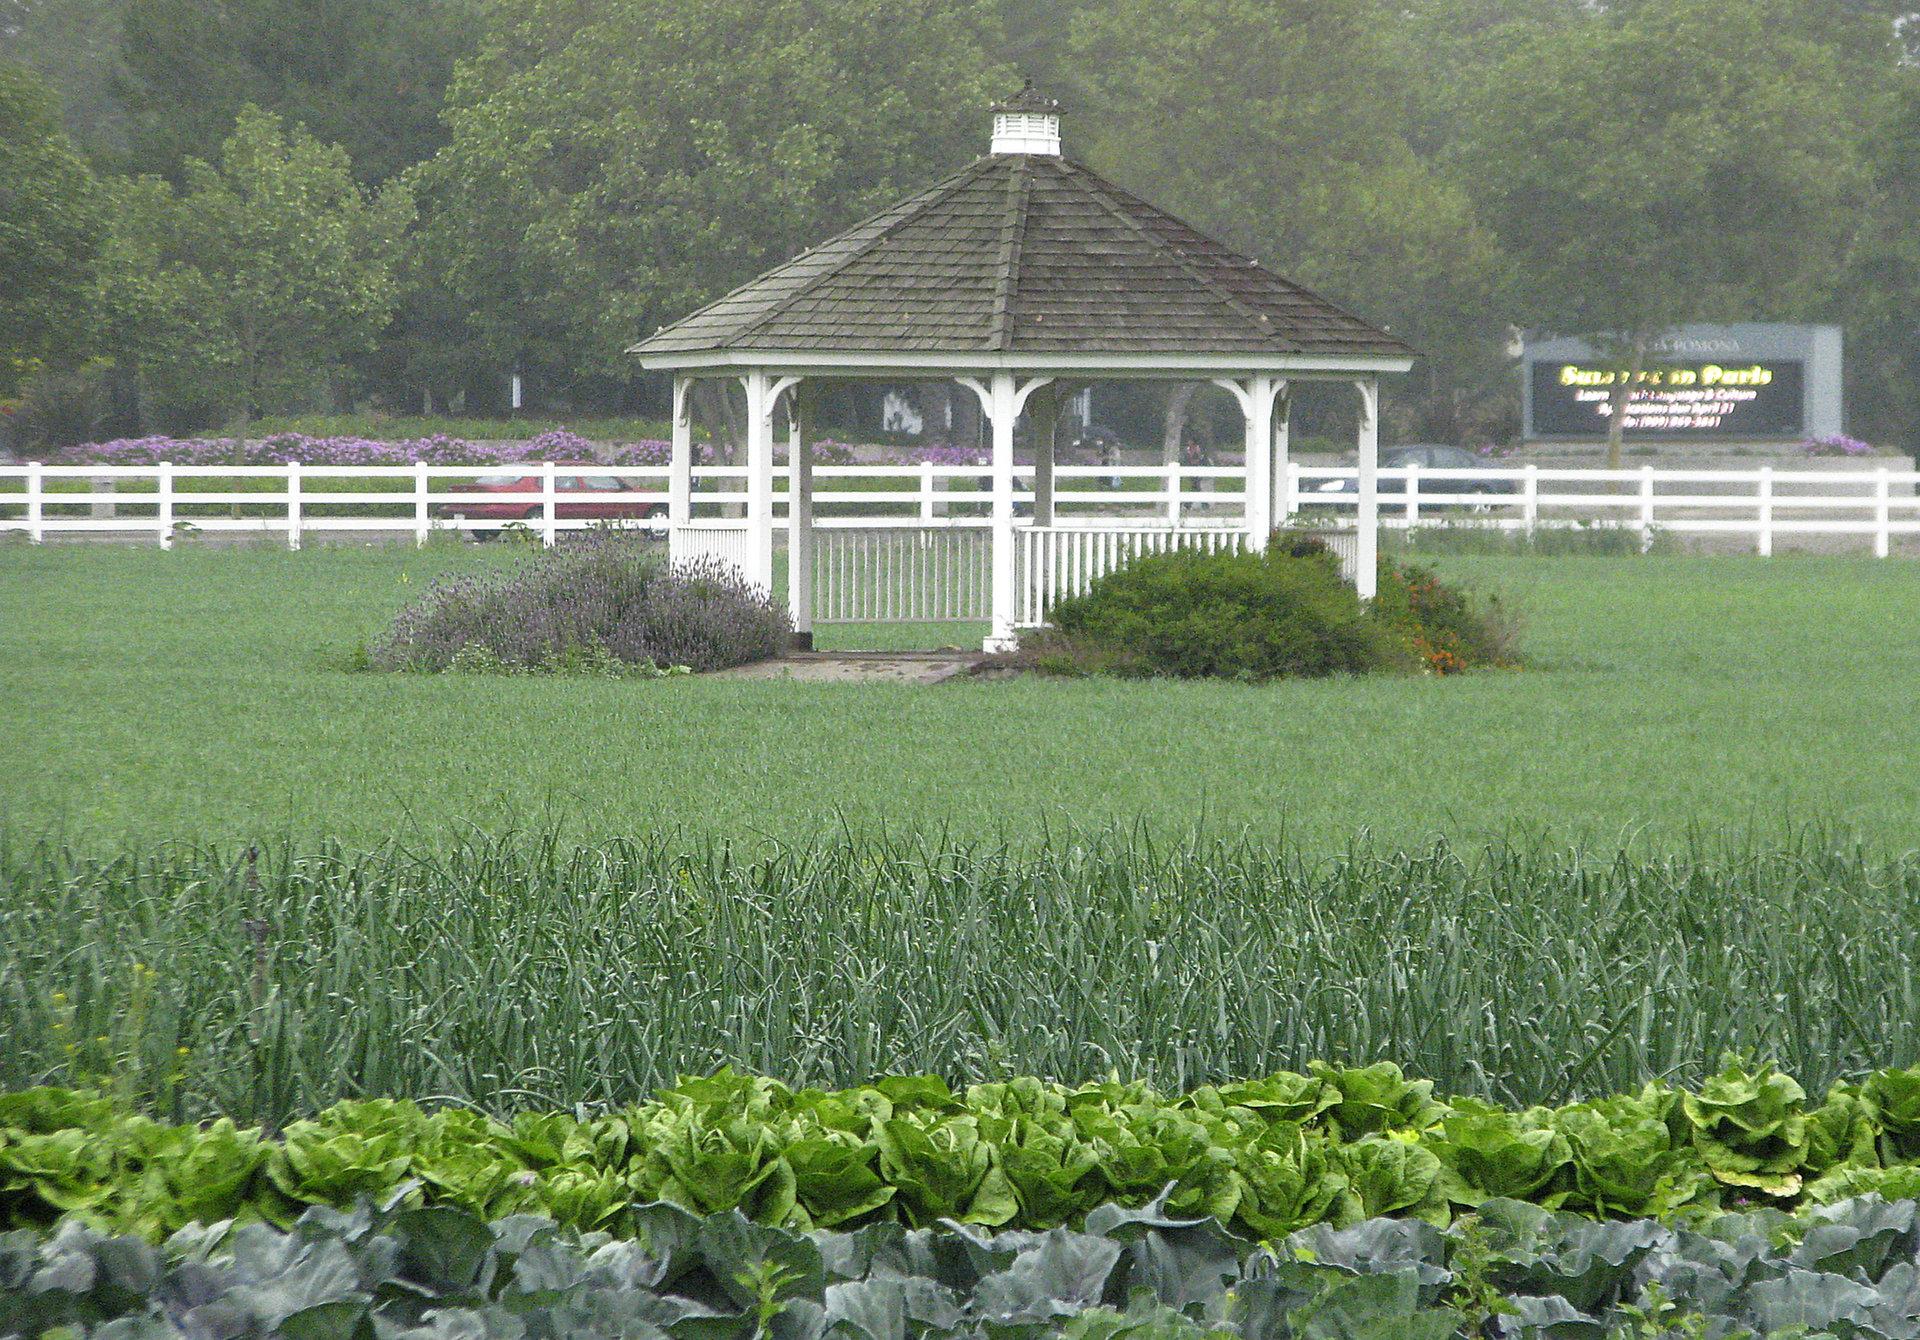 Kellogg Farm